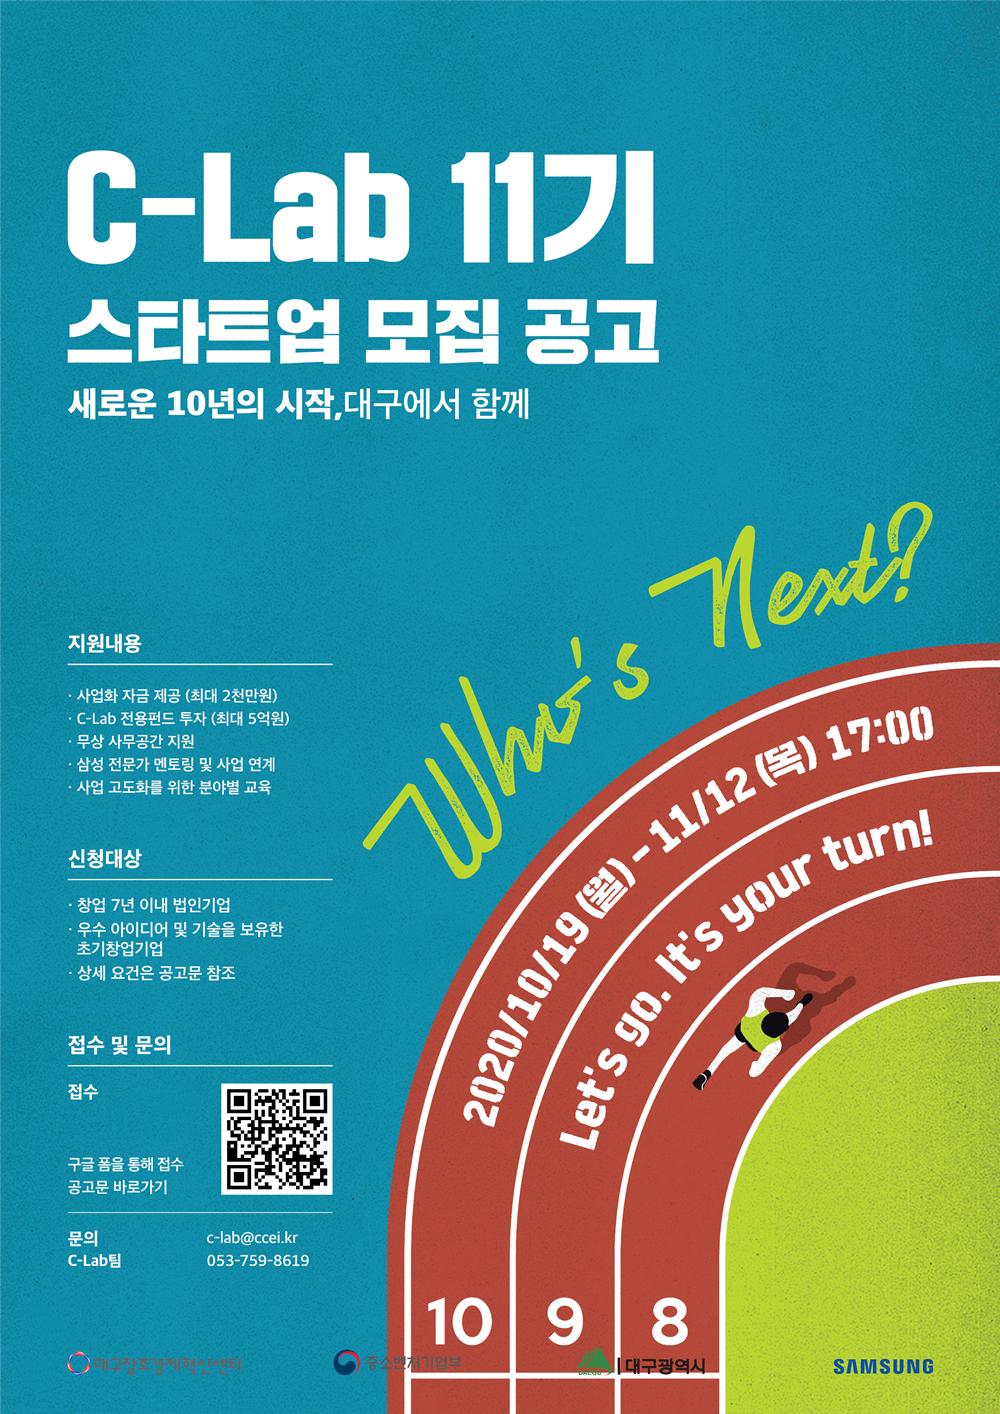 C-Lab 11기 스타트업 모집 공고 새로운 10년의 시작, 대구에서 함께 What's Next? 10 2020/10/19(월) - 11/12(목) 17:00 9 Let's go. It's your turn! 8 달리기 트랙을 달리는 사람 이미지 지원 내용 사업화 자금 제공(최대 2천만원) C-Lab 전용펀드 투자(최대 5억원) 무상 사무공간 지원 삼성 전문가 멘토링 및 사업 연계 사업 고도화를 위한 분야별 교육 신청대상 창업 7년 이내 법인기업 우수 아이디어 및 기술을 보유한 초기창업기업 상세 요건은 공고문 참조 접수 및 문의 접수 (https://ccei.creativekorea.or.kr/daegu/custom/notice_view.do?no=19589&div_code=&rnum=795&pn=1&kind=my&sPtime=now&sMenuType=&pagePerContents=8&cmntySeqNum=&menuSeqNum=&storyList=&sdate=&edate=&title=&contents= ) 구글 폼을 통해 접수 공고문 바로가기 문의 C-Lab팀 c-lab@ccei.kr 053-759-8619 대구창조경제혁신센터 중소벤처기업부 대구광역시 SAMSUNG